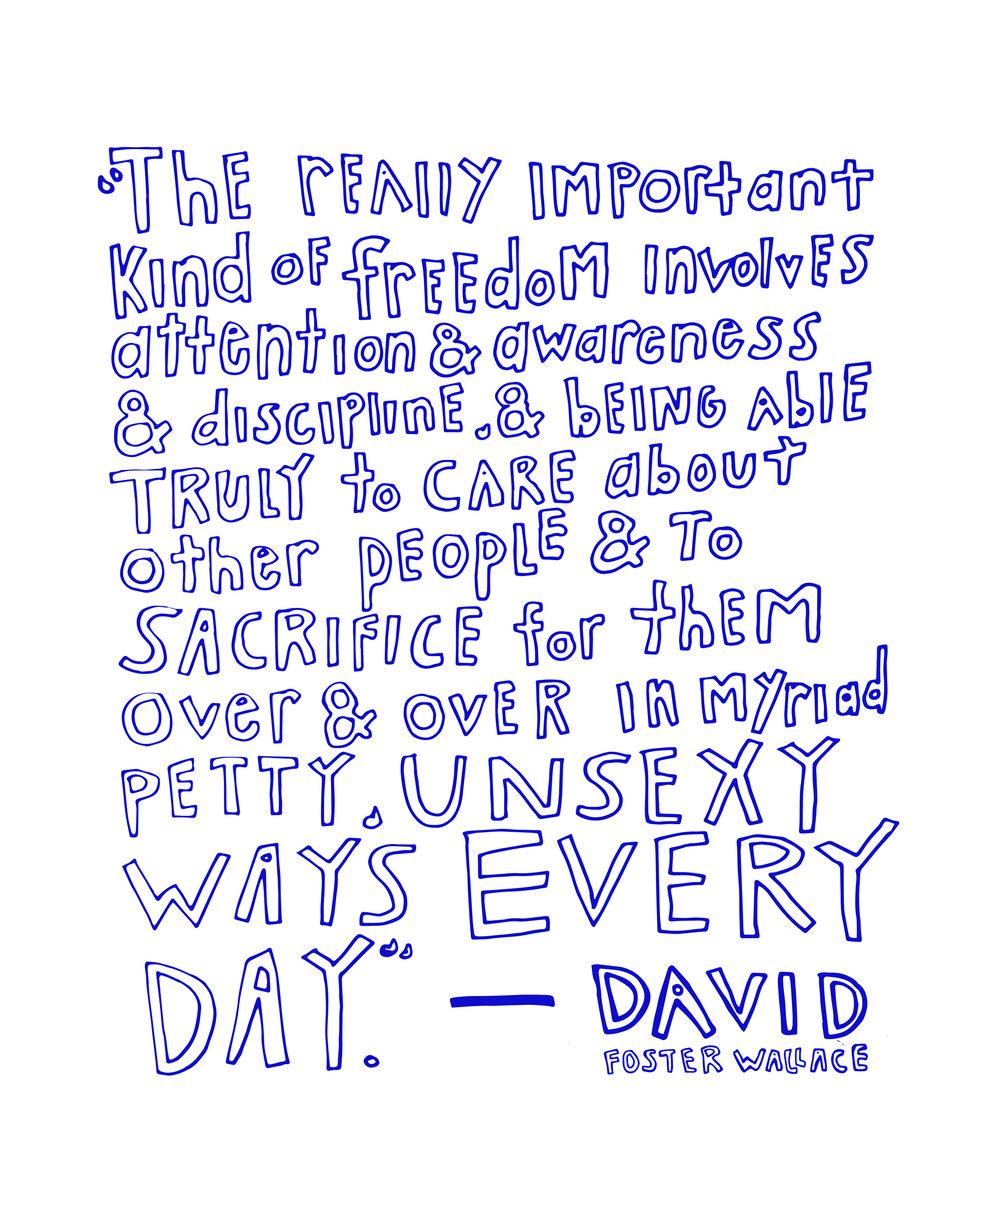 DFW quote newest.jpg